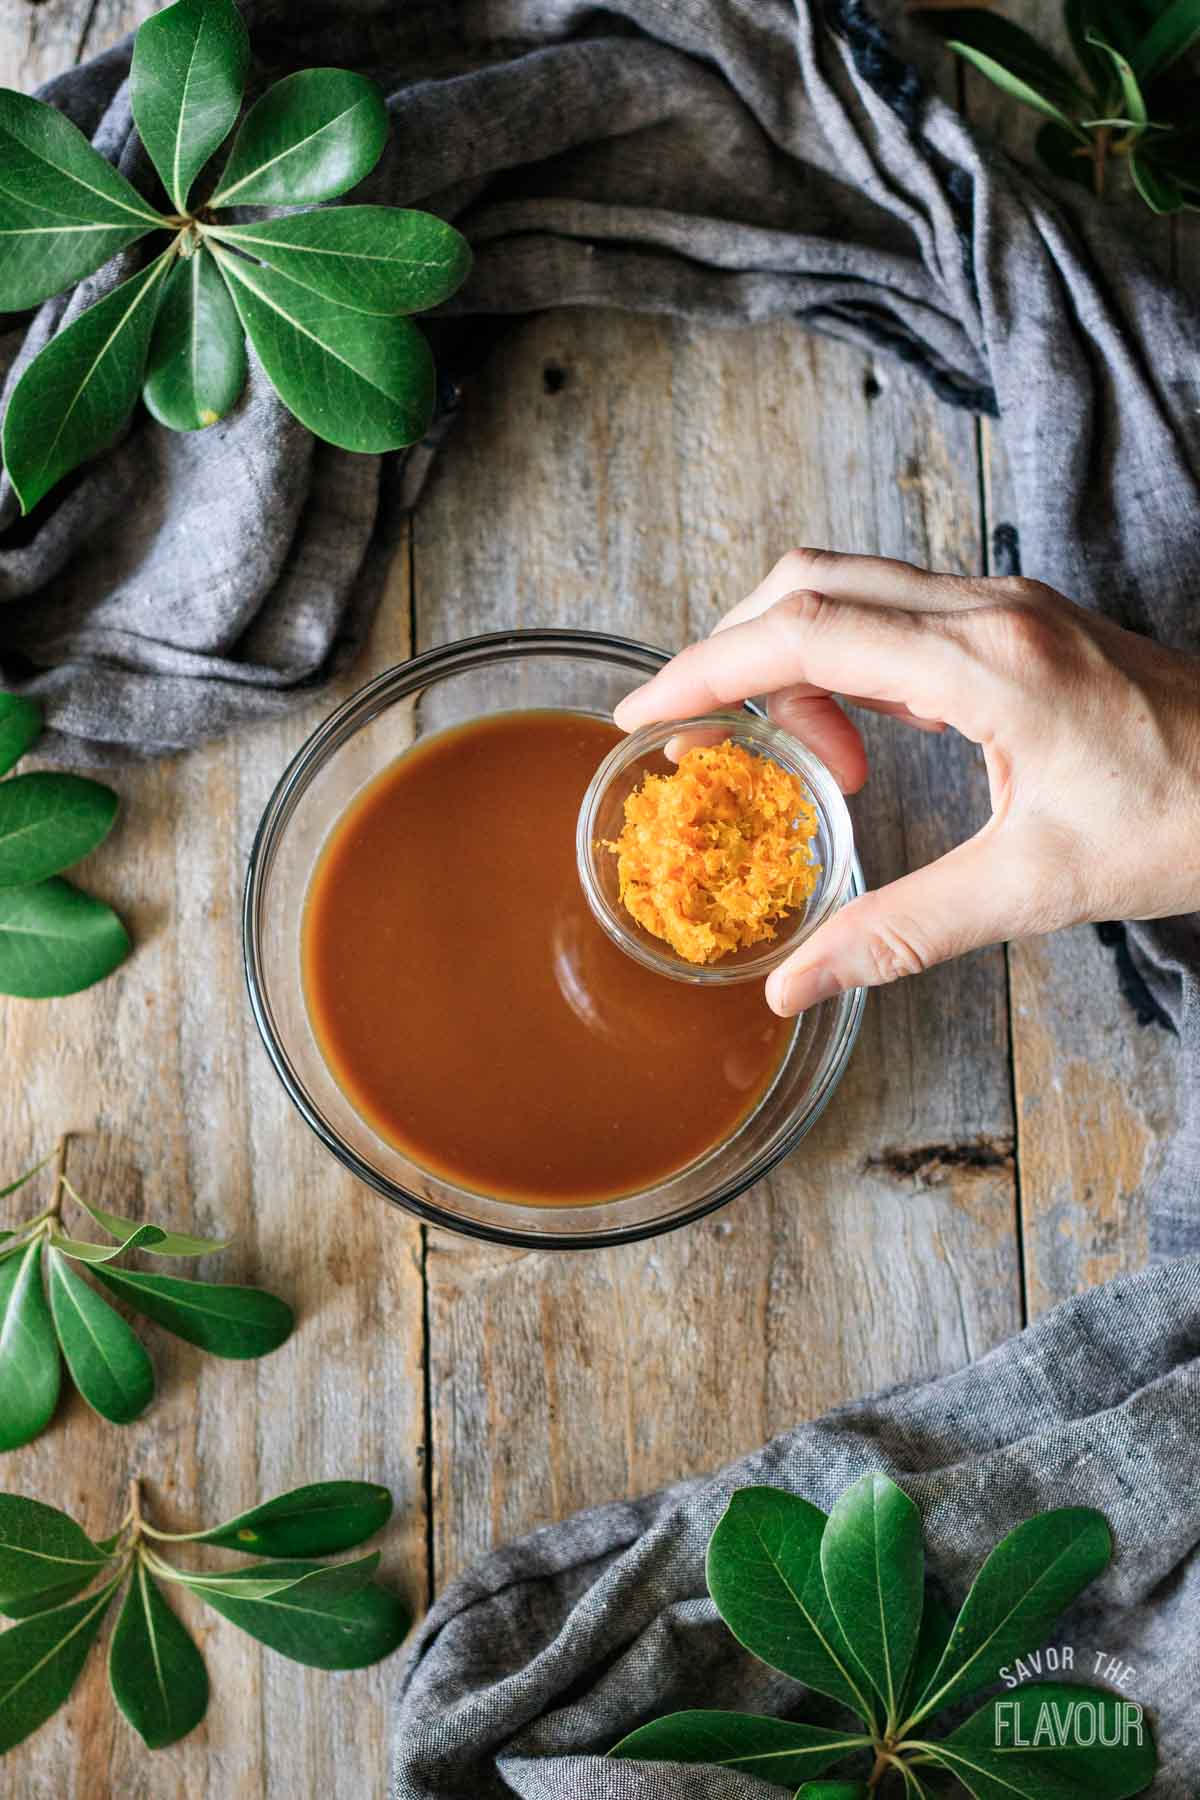 adding orange zest to the orange sauce